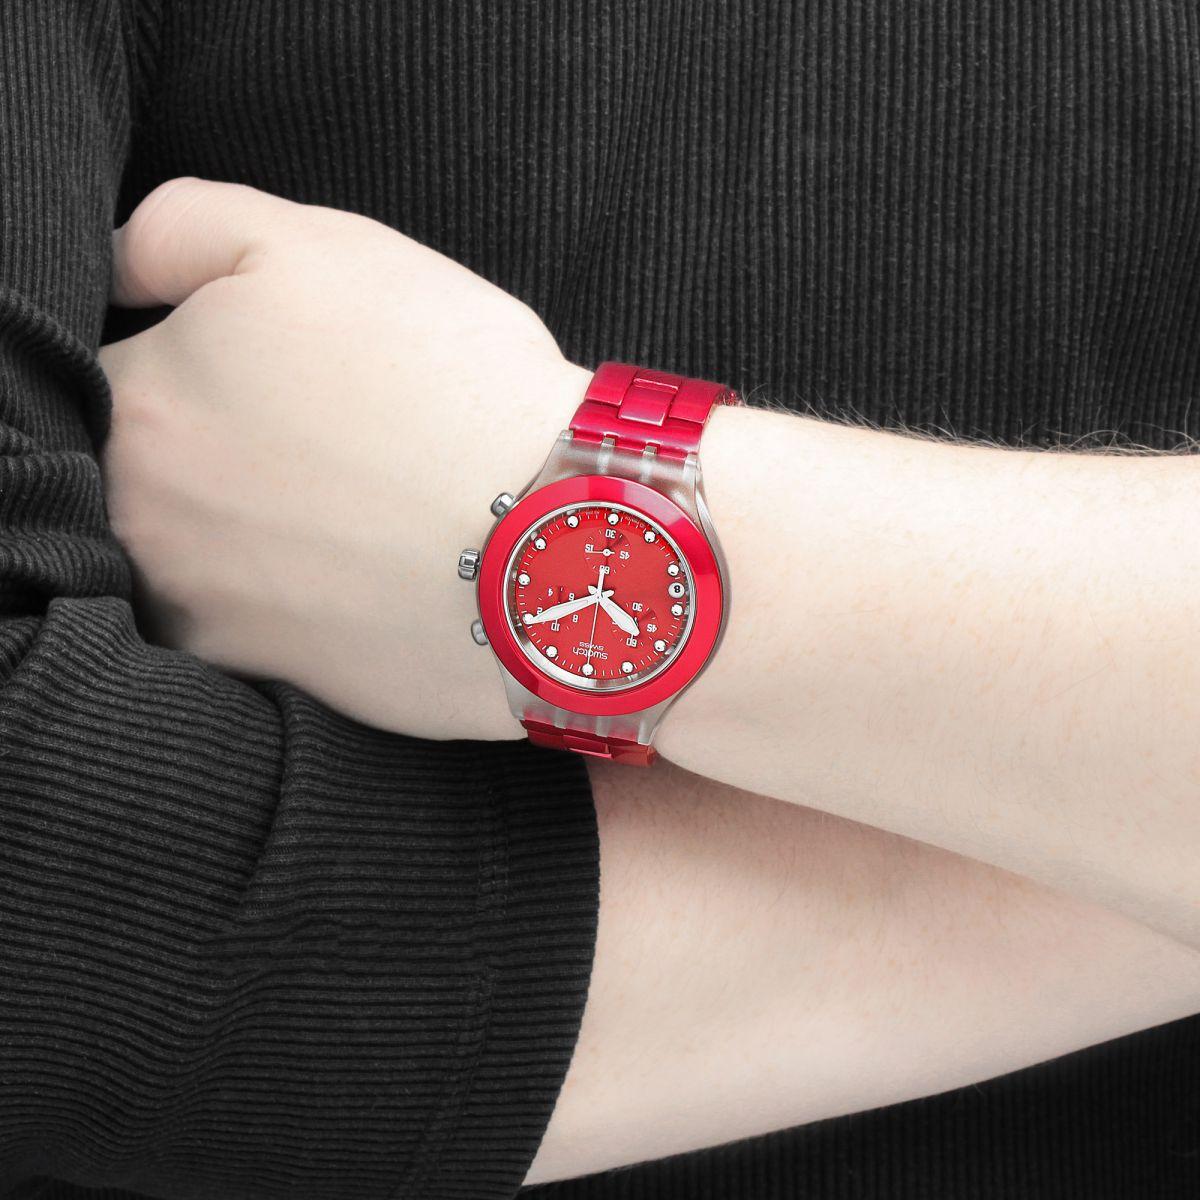 مدل ساعت سواچ